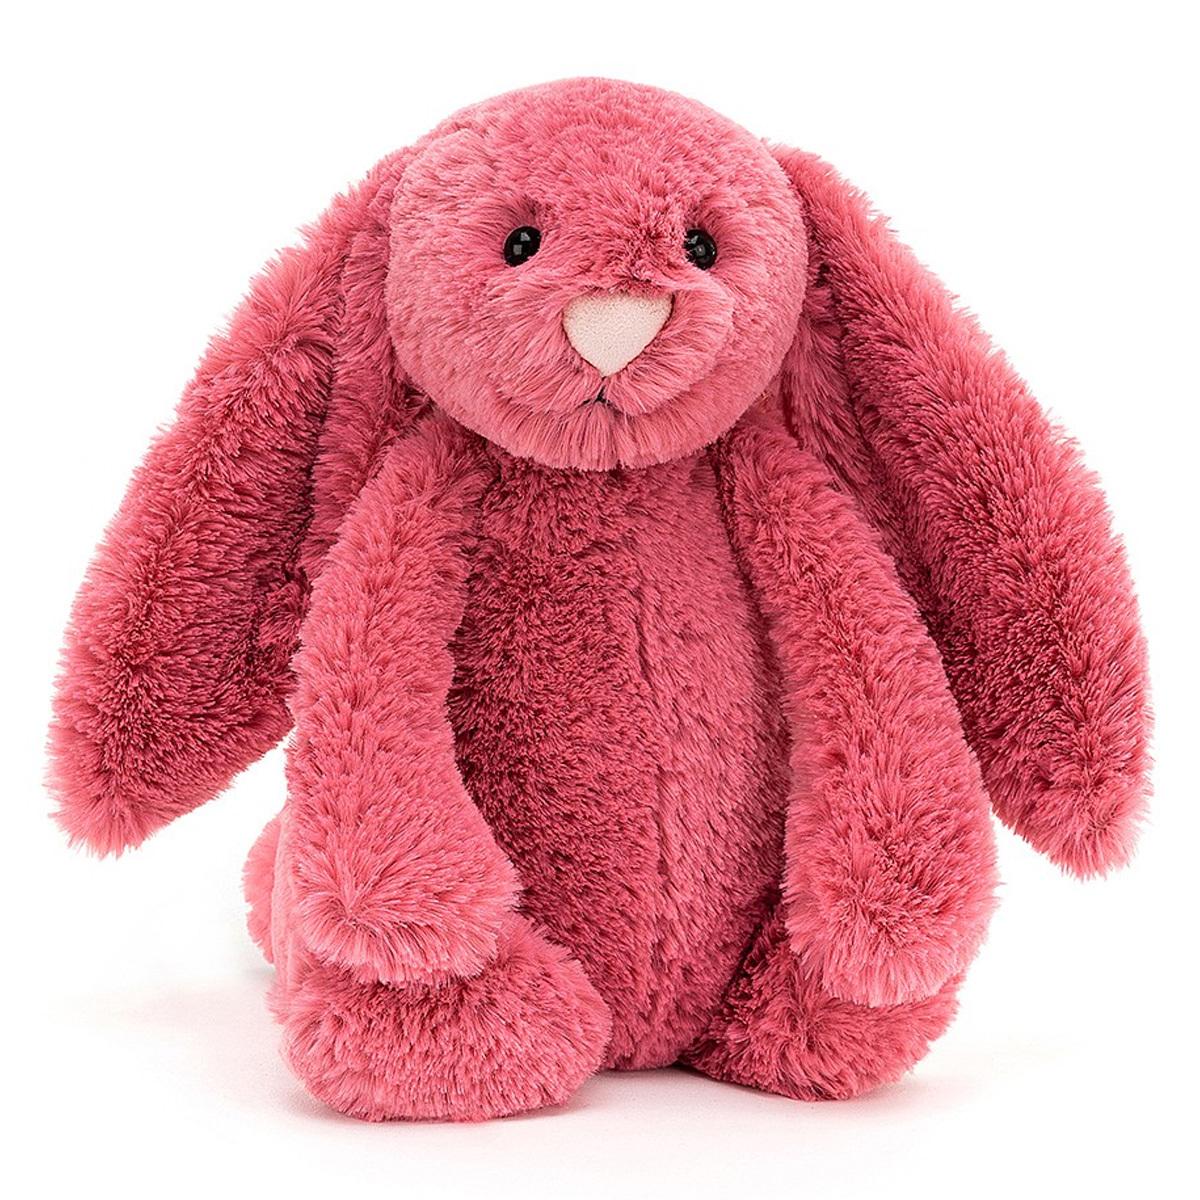 Peluche Bashful Cerise Bunny - Medium Peluche Lapin 31 cm